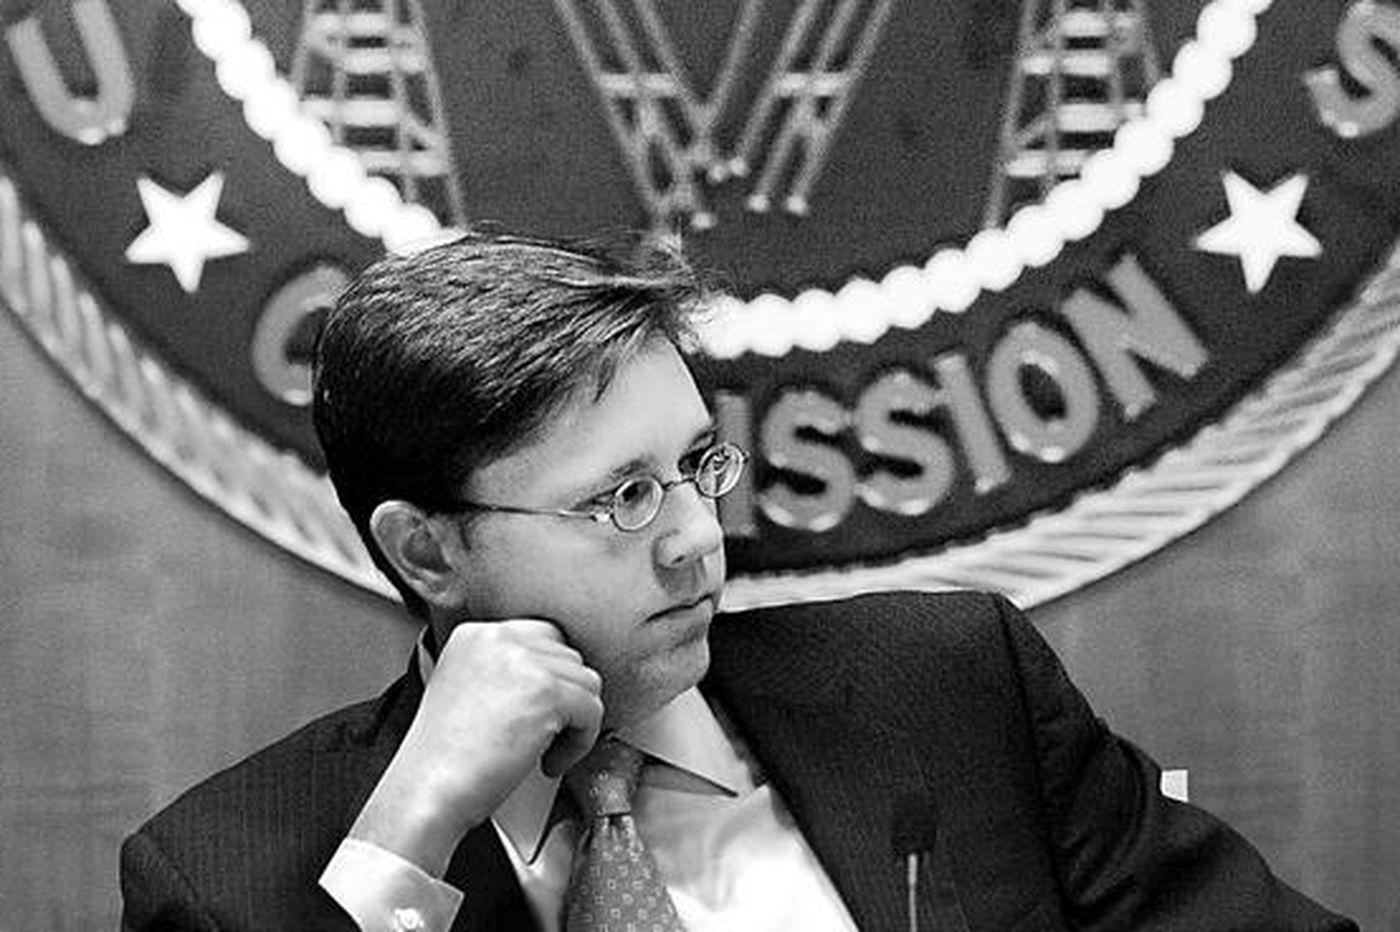 Congressional report faults FCC's Martin